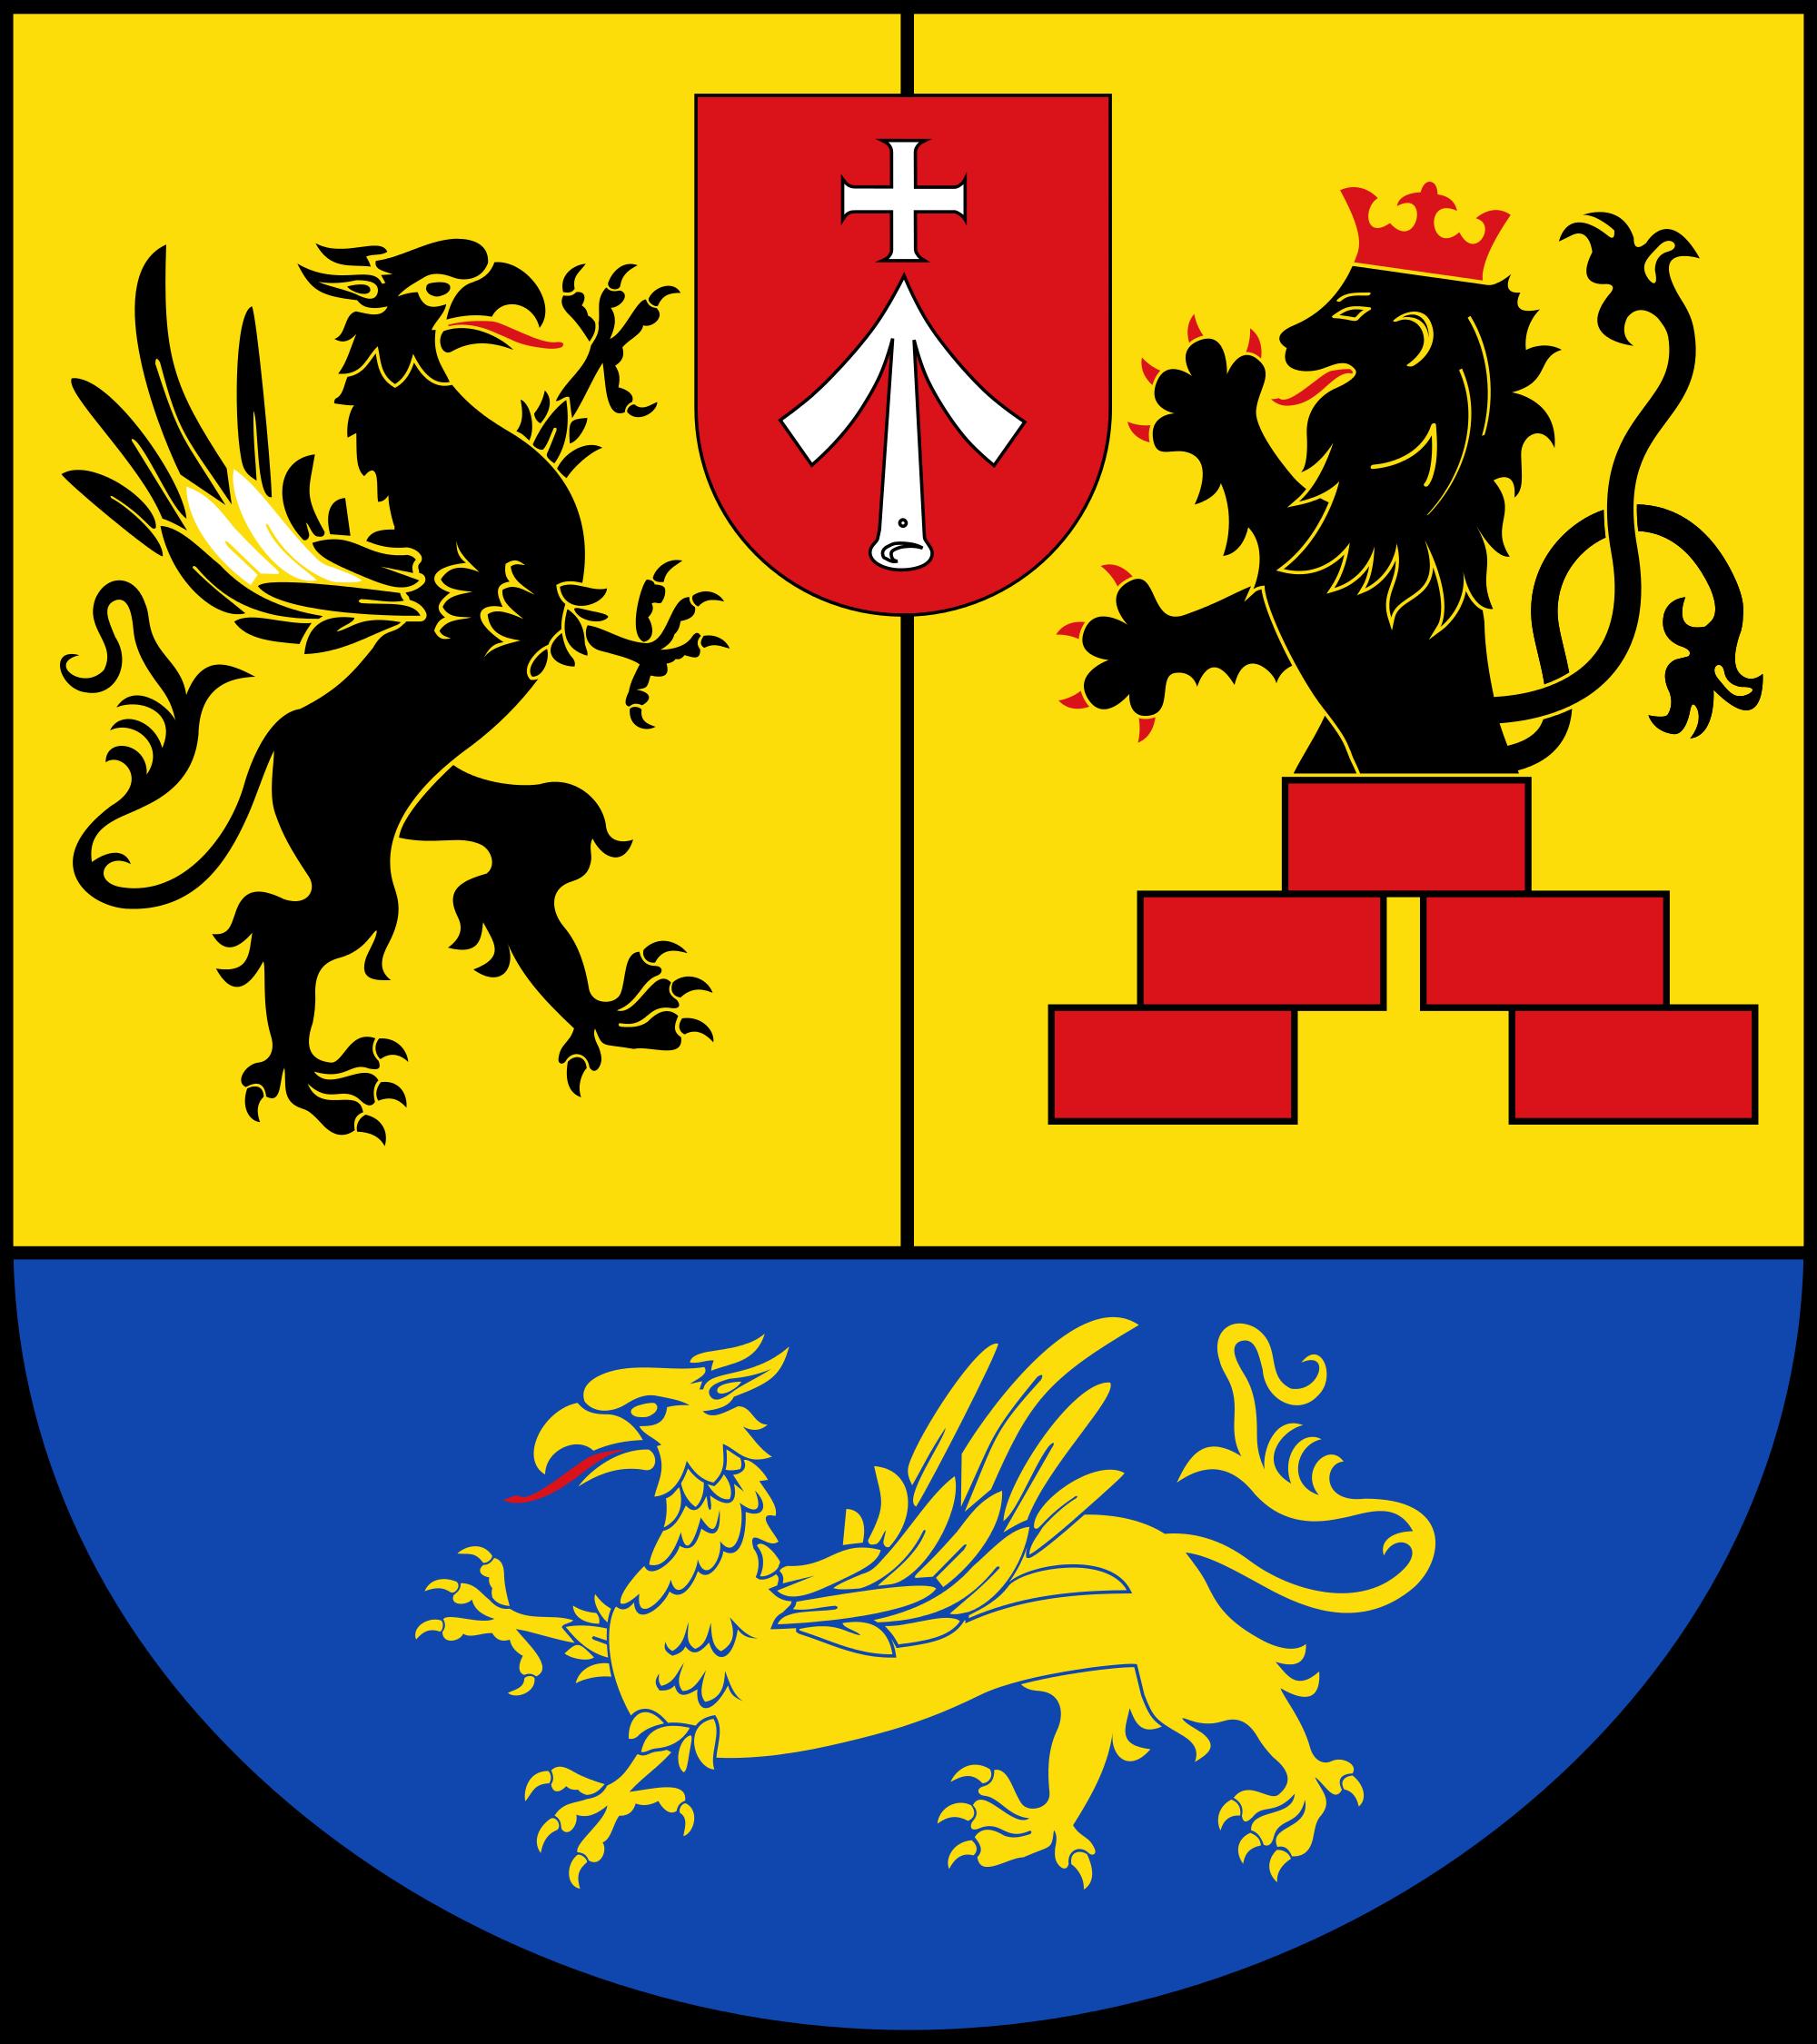 File:Wappen des Landkreises Vorpommern.